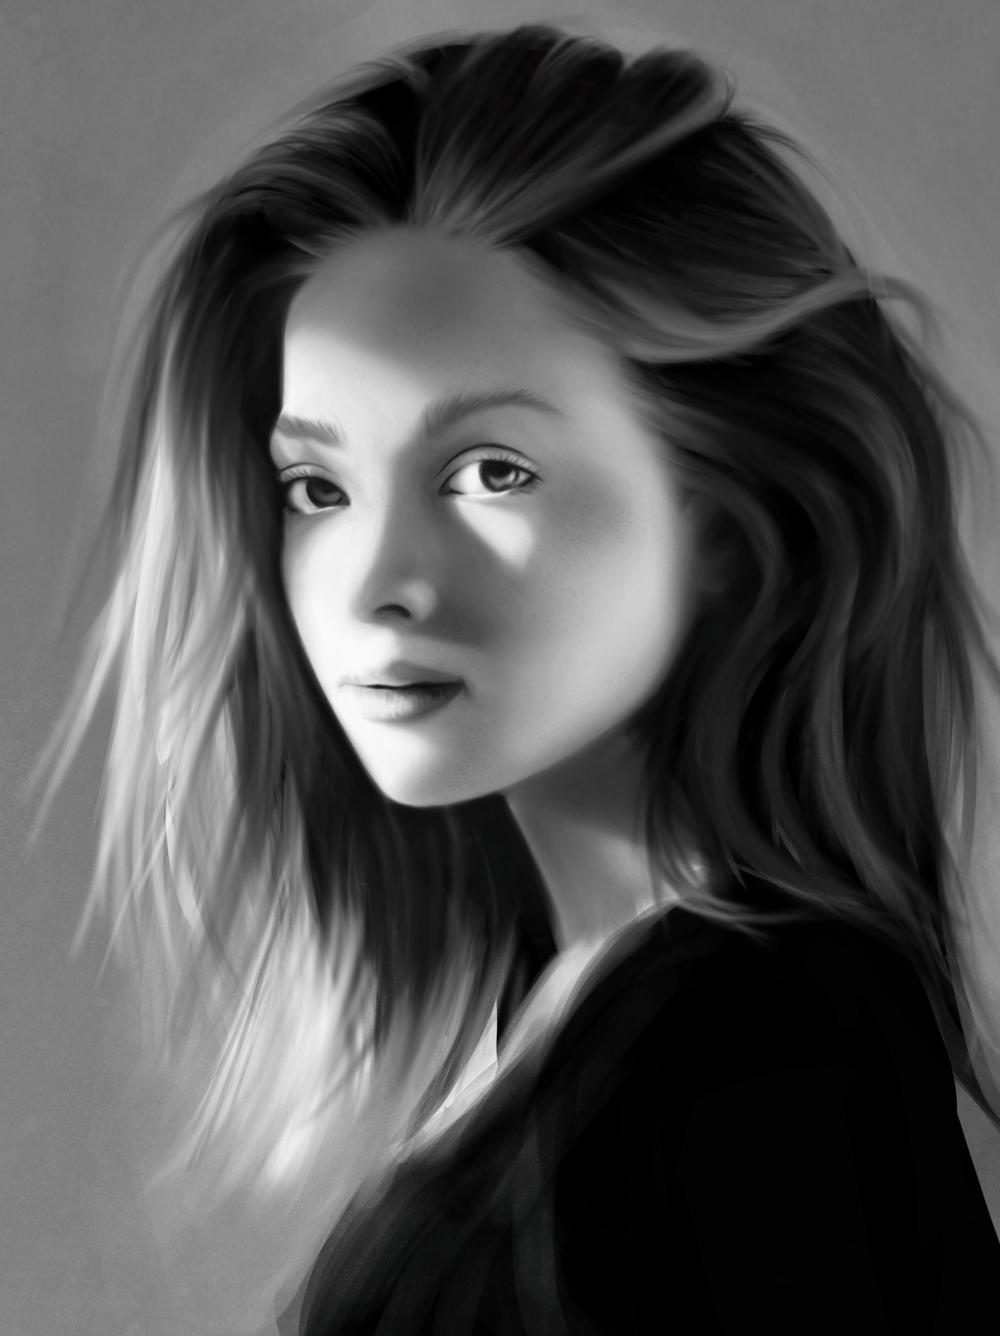 Karina Tess - image 1 - student project